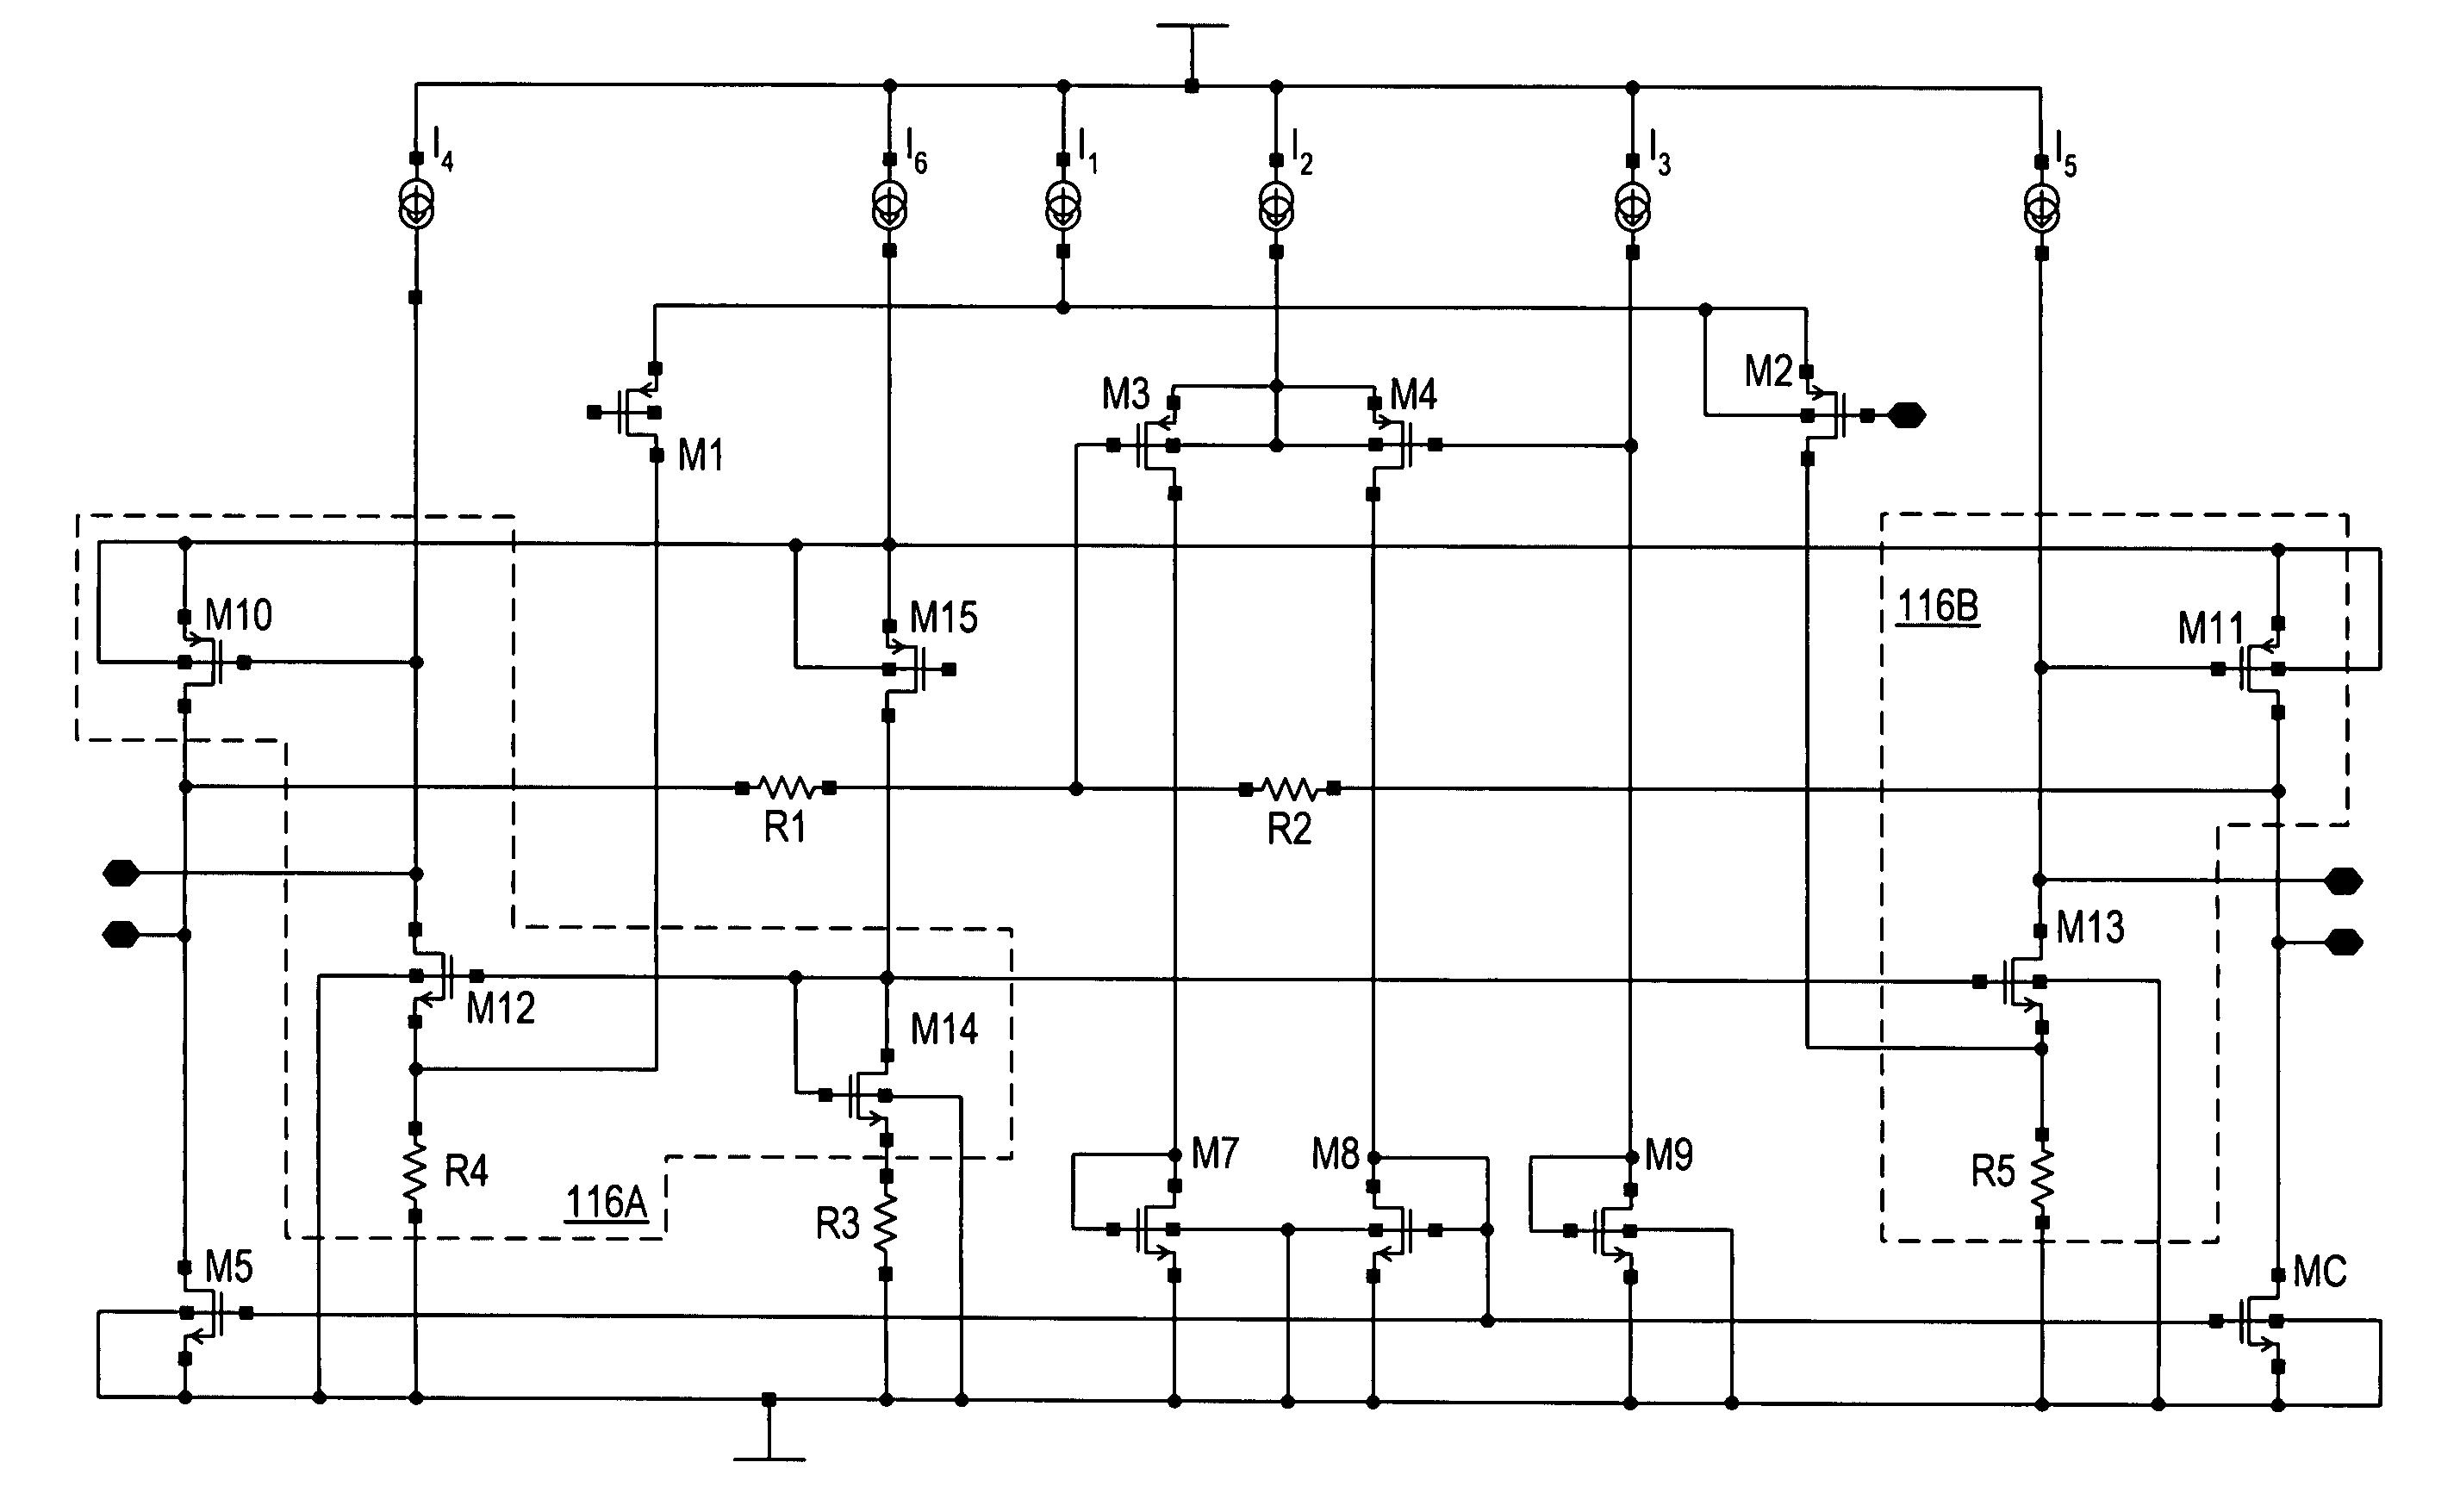 Patente Us6937100 Amplifier Circuit With Common Mode Feedback Op Amp Zero Method Diagram Amplifiercircuit Patent Drawing